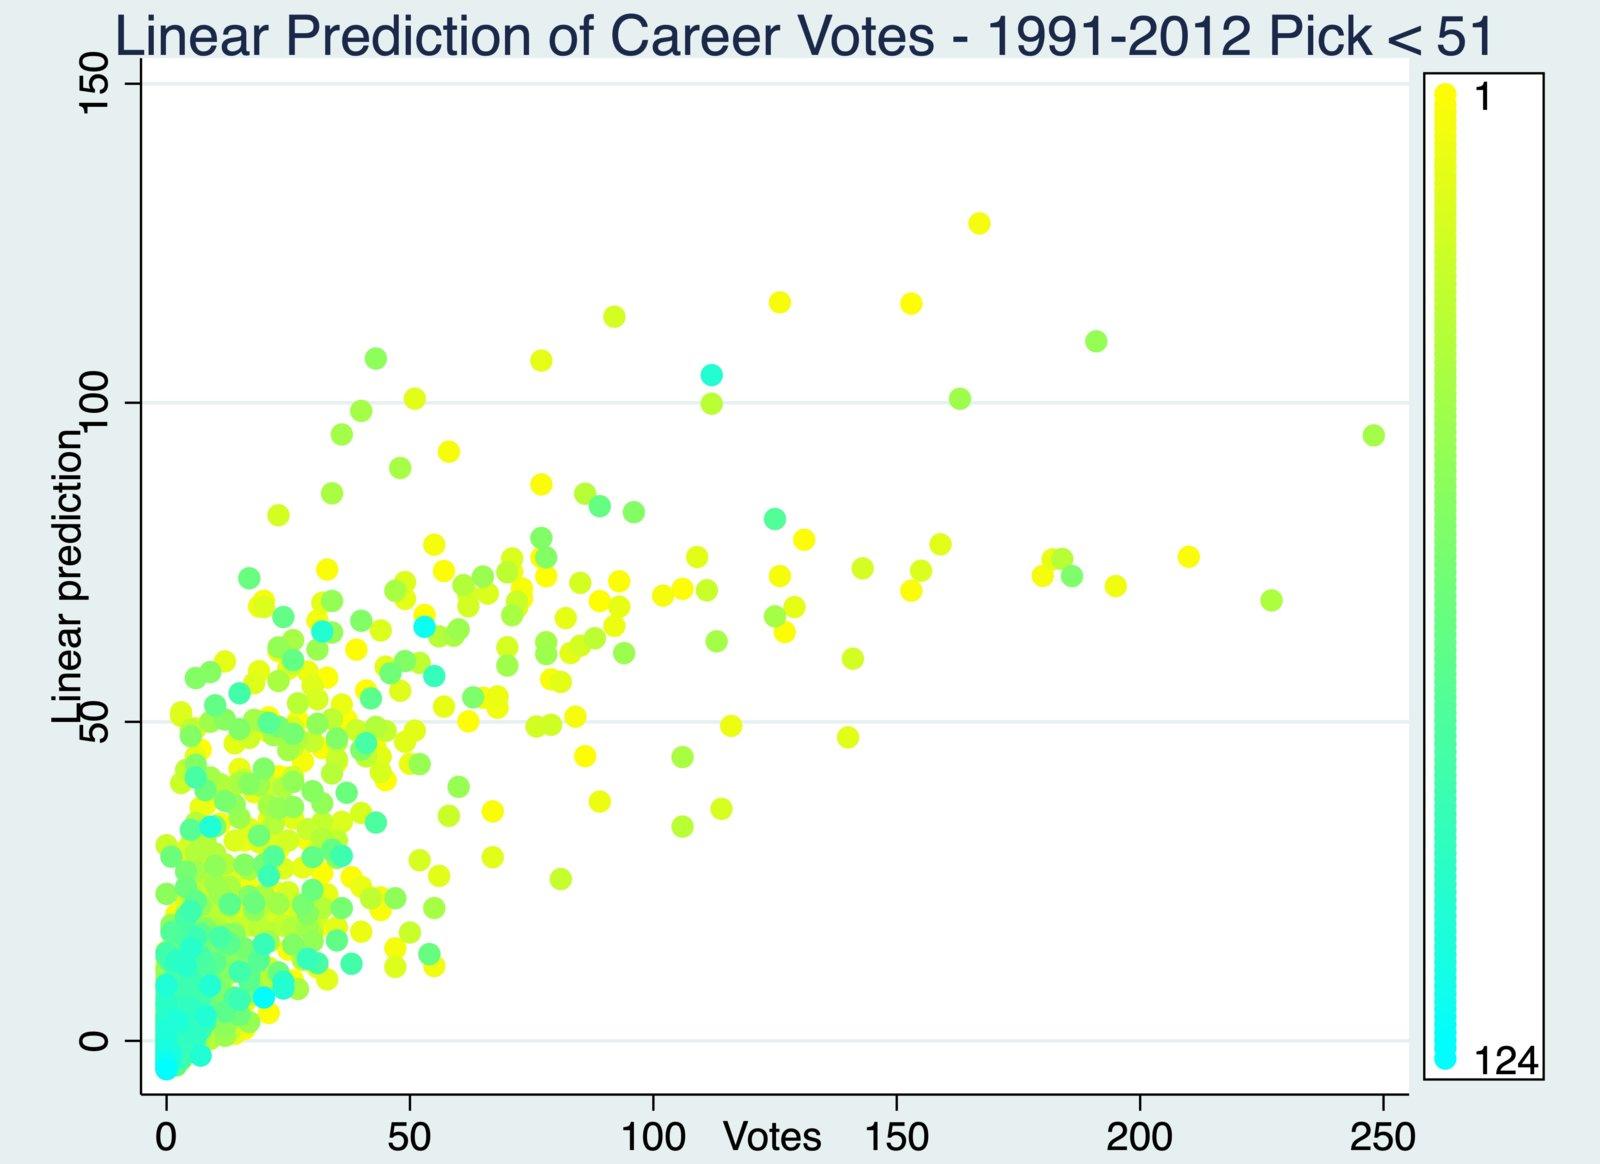 Linear PRediction of Career Votes - 1991-2012 Pick < 51.jpg